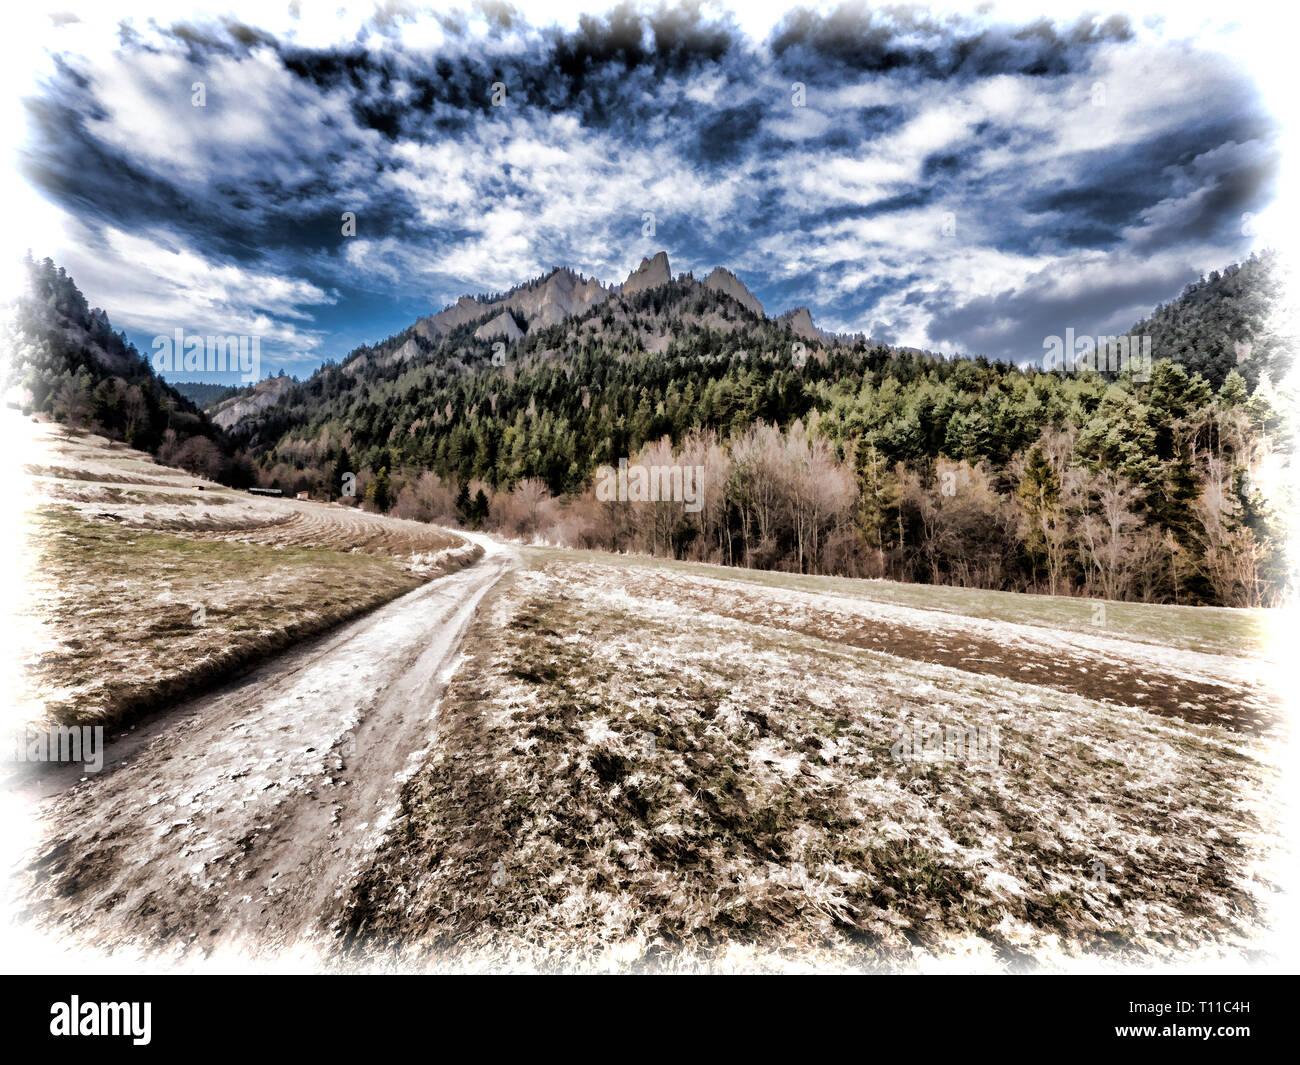 Trzy Korony Peak in Pieniny Mountains in Poland - Stock Image